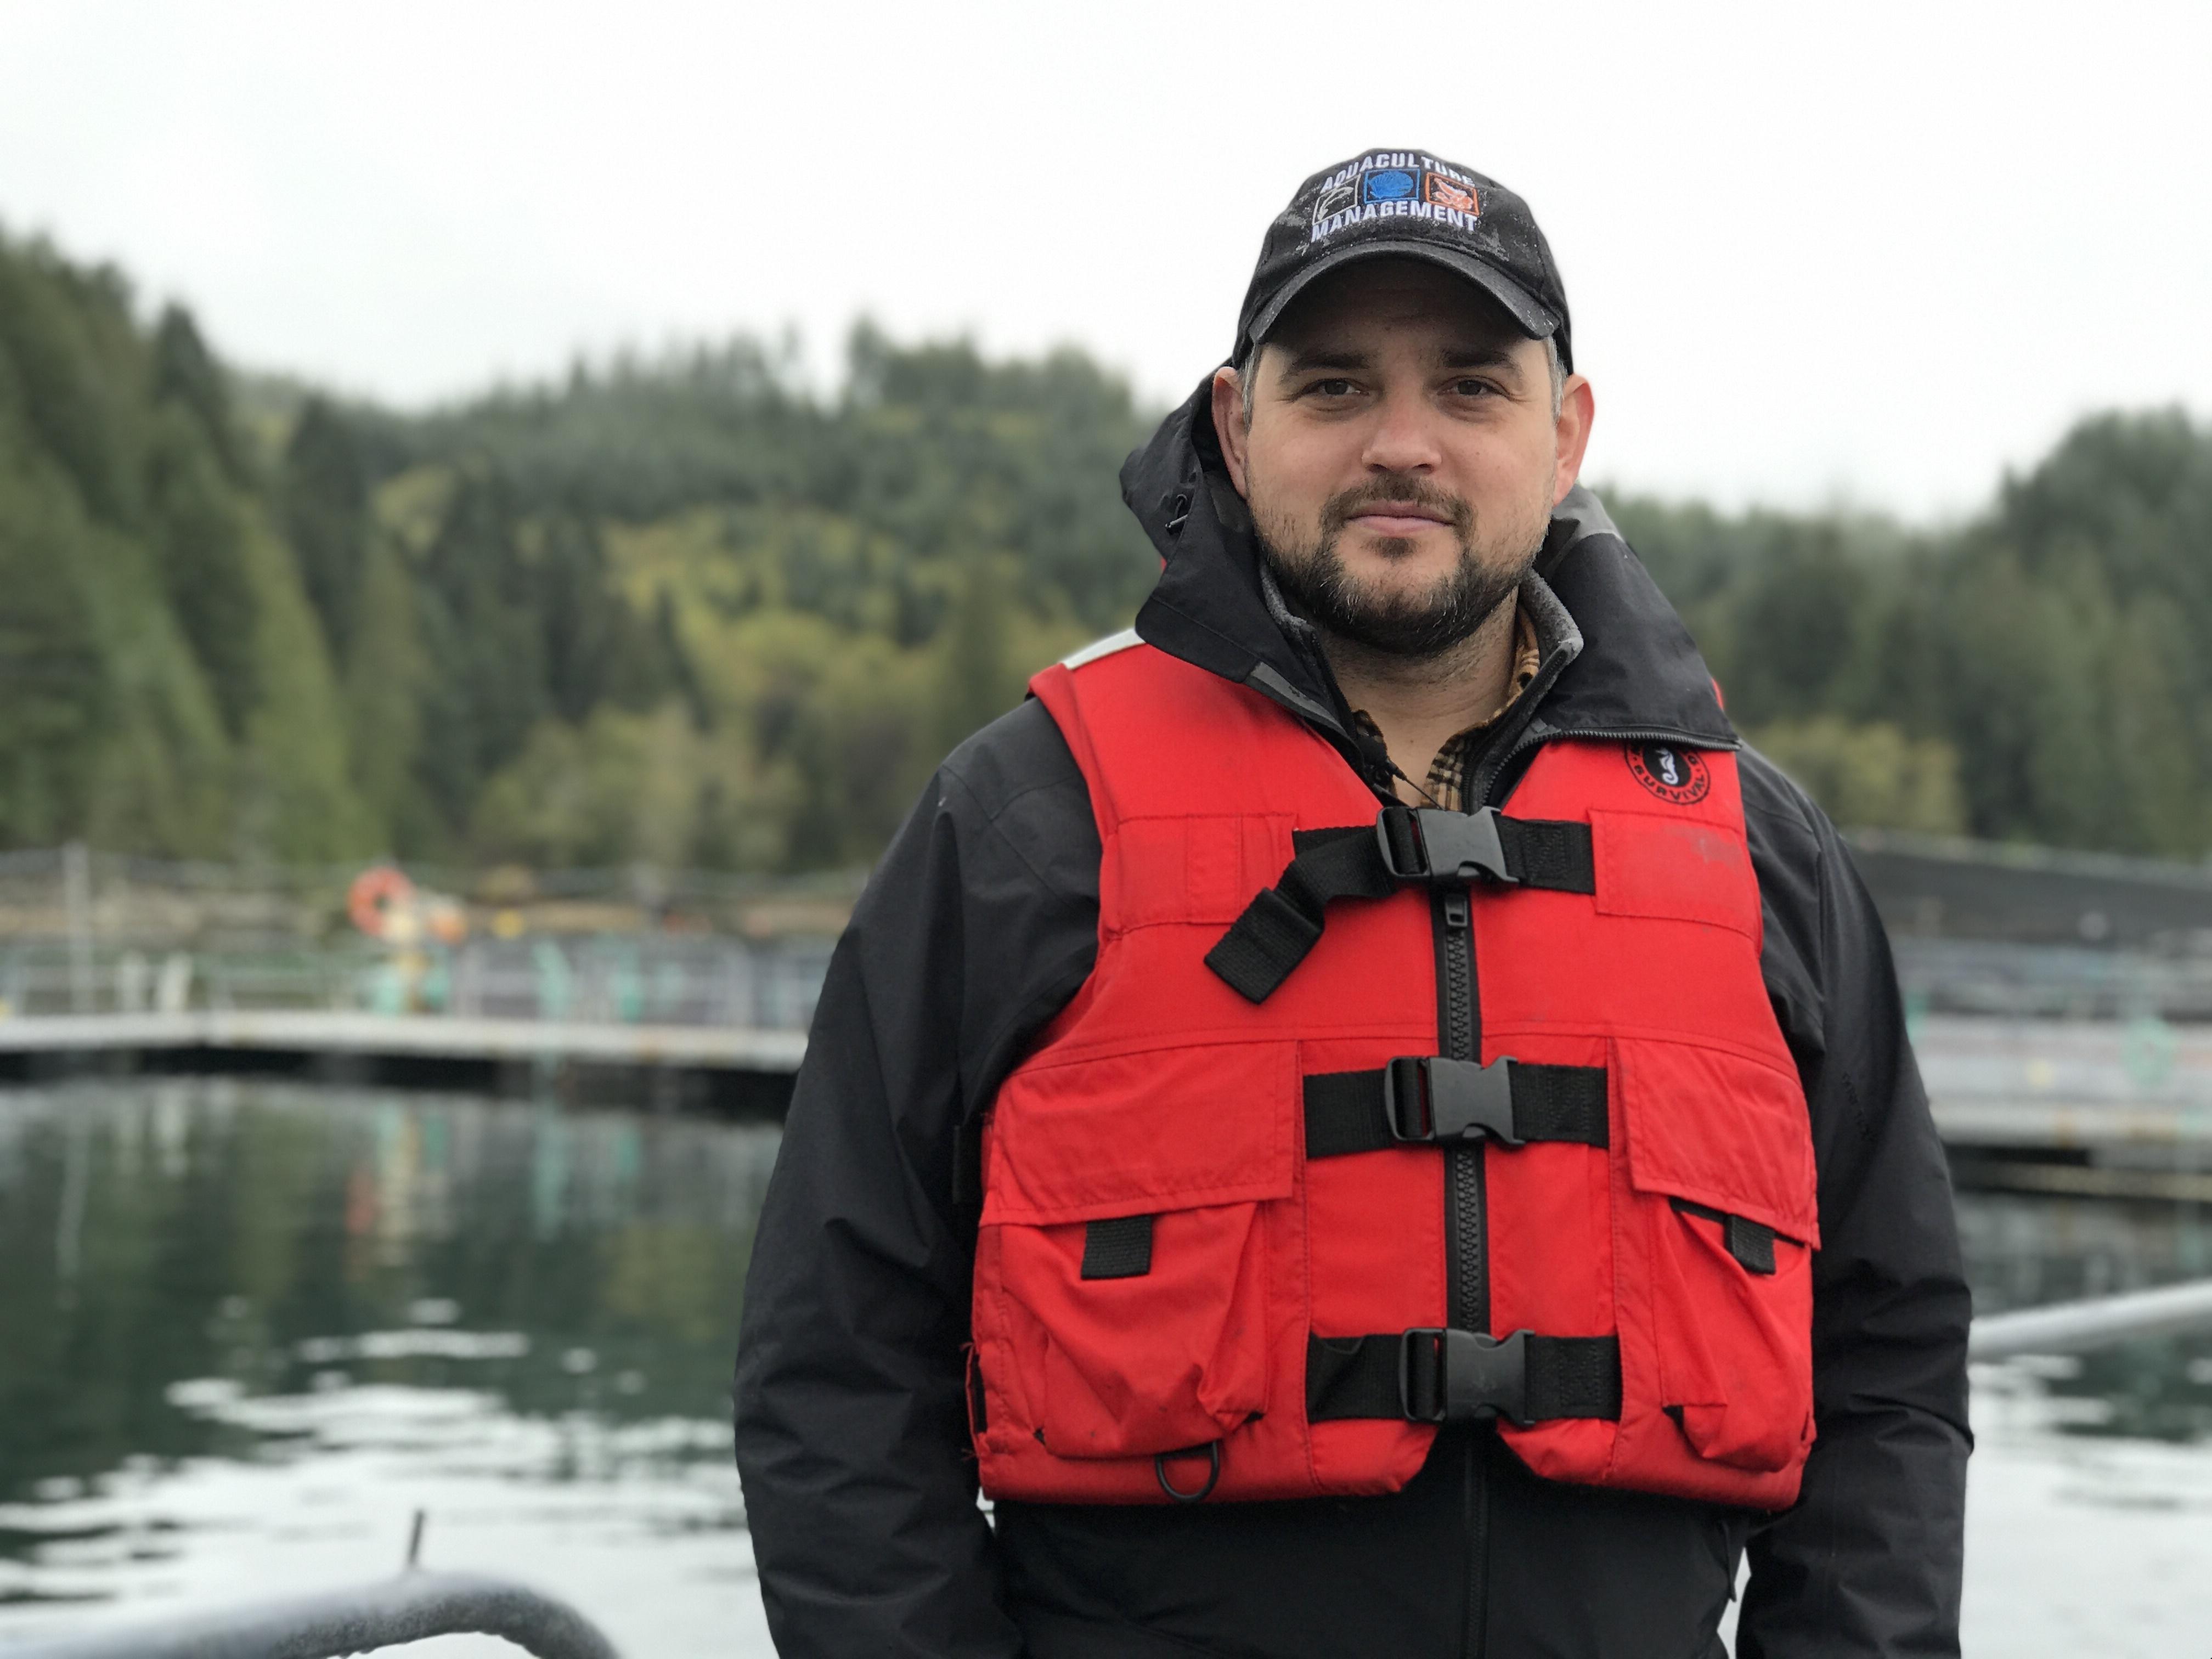 Zachary Waddington is the lead aquaculture veterinarian for DFO in the Pacific Region. (Megan Thomas/CBC)